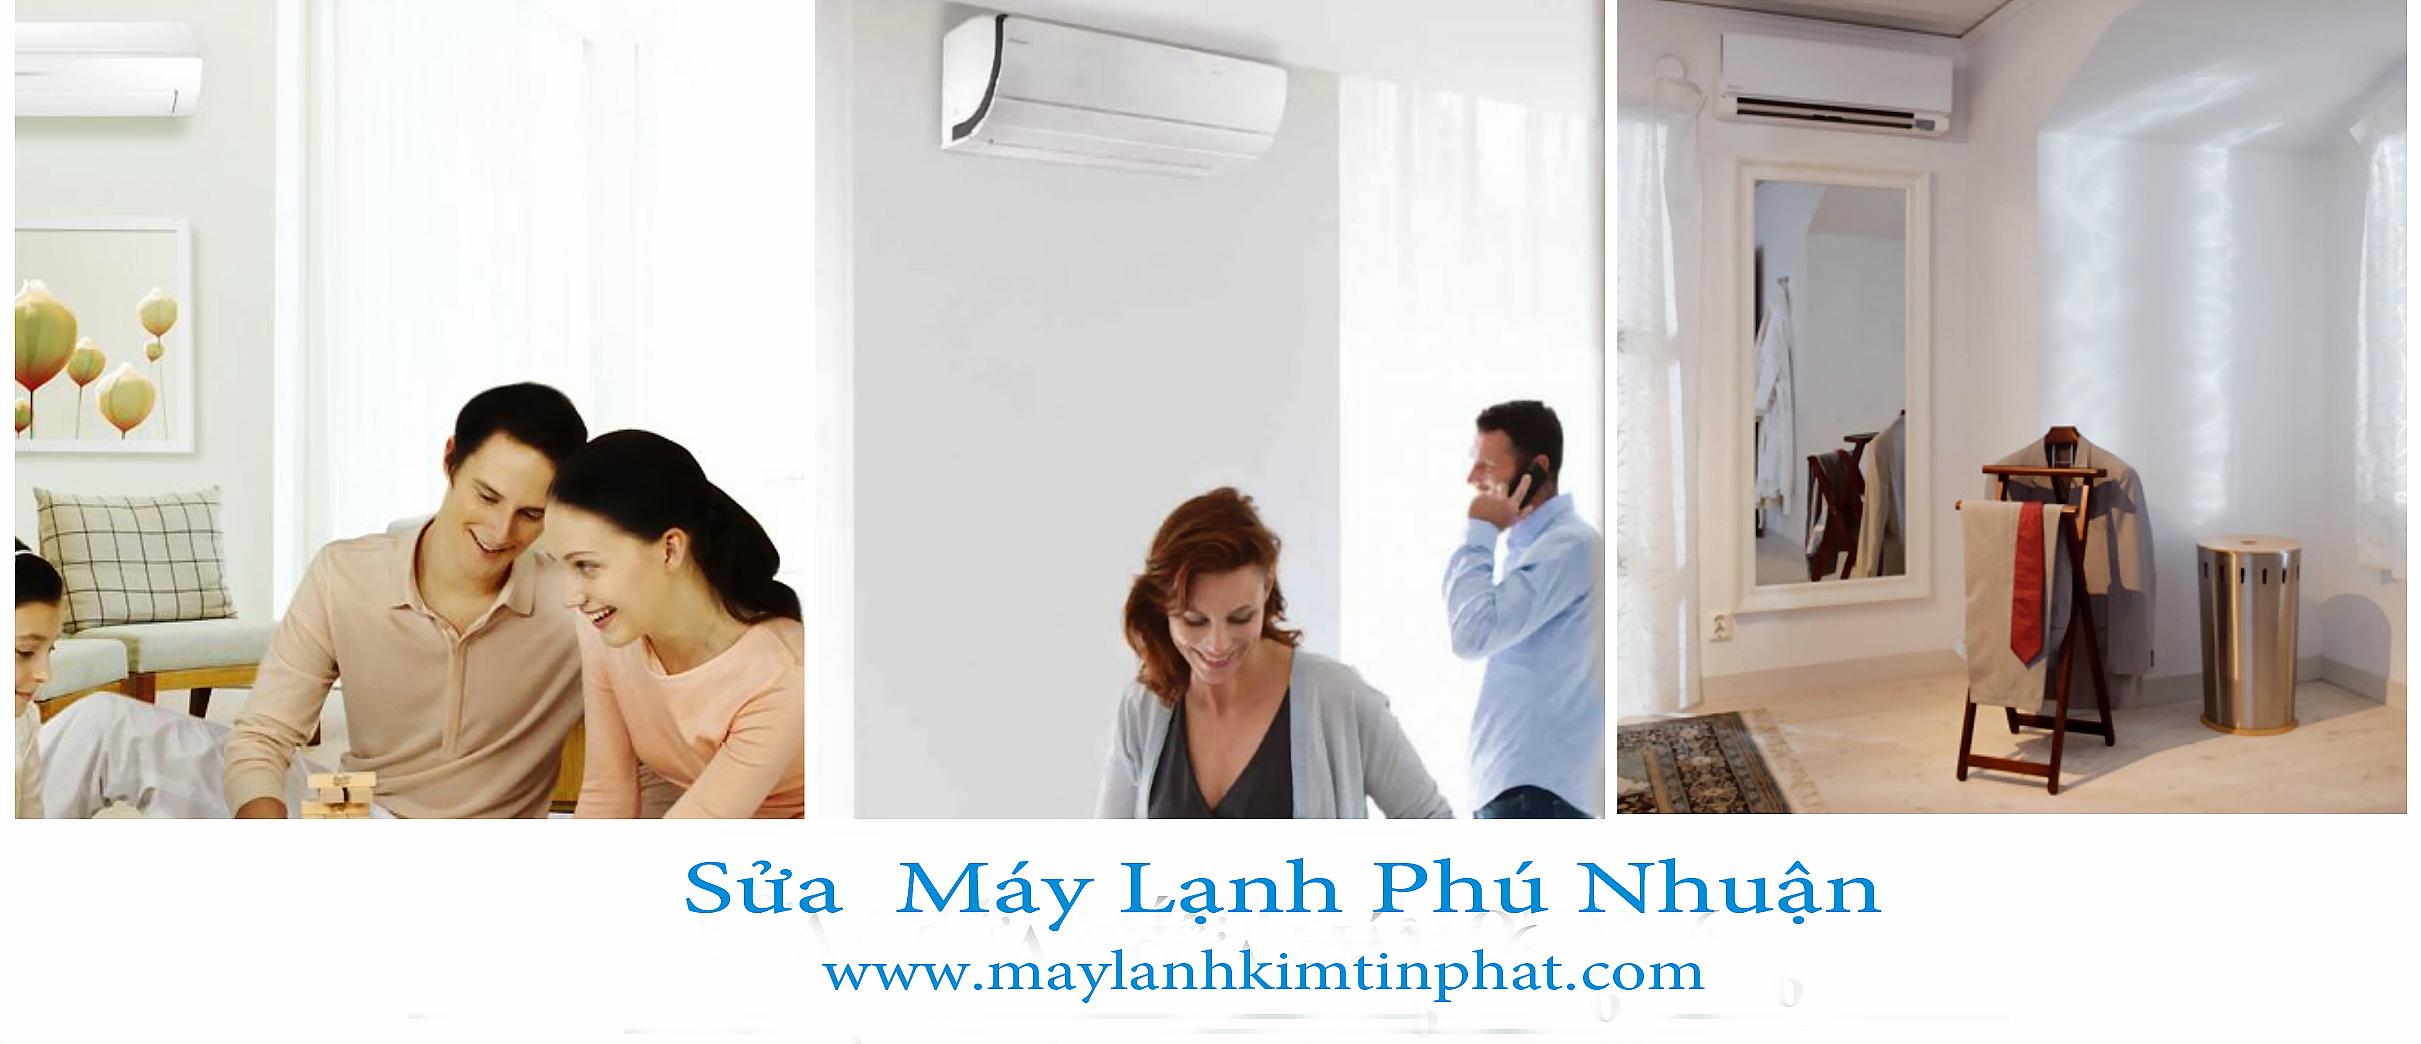 sua may lanh phu nhuan